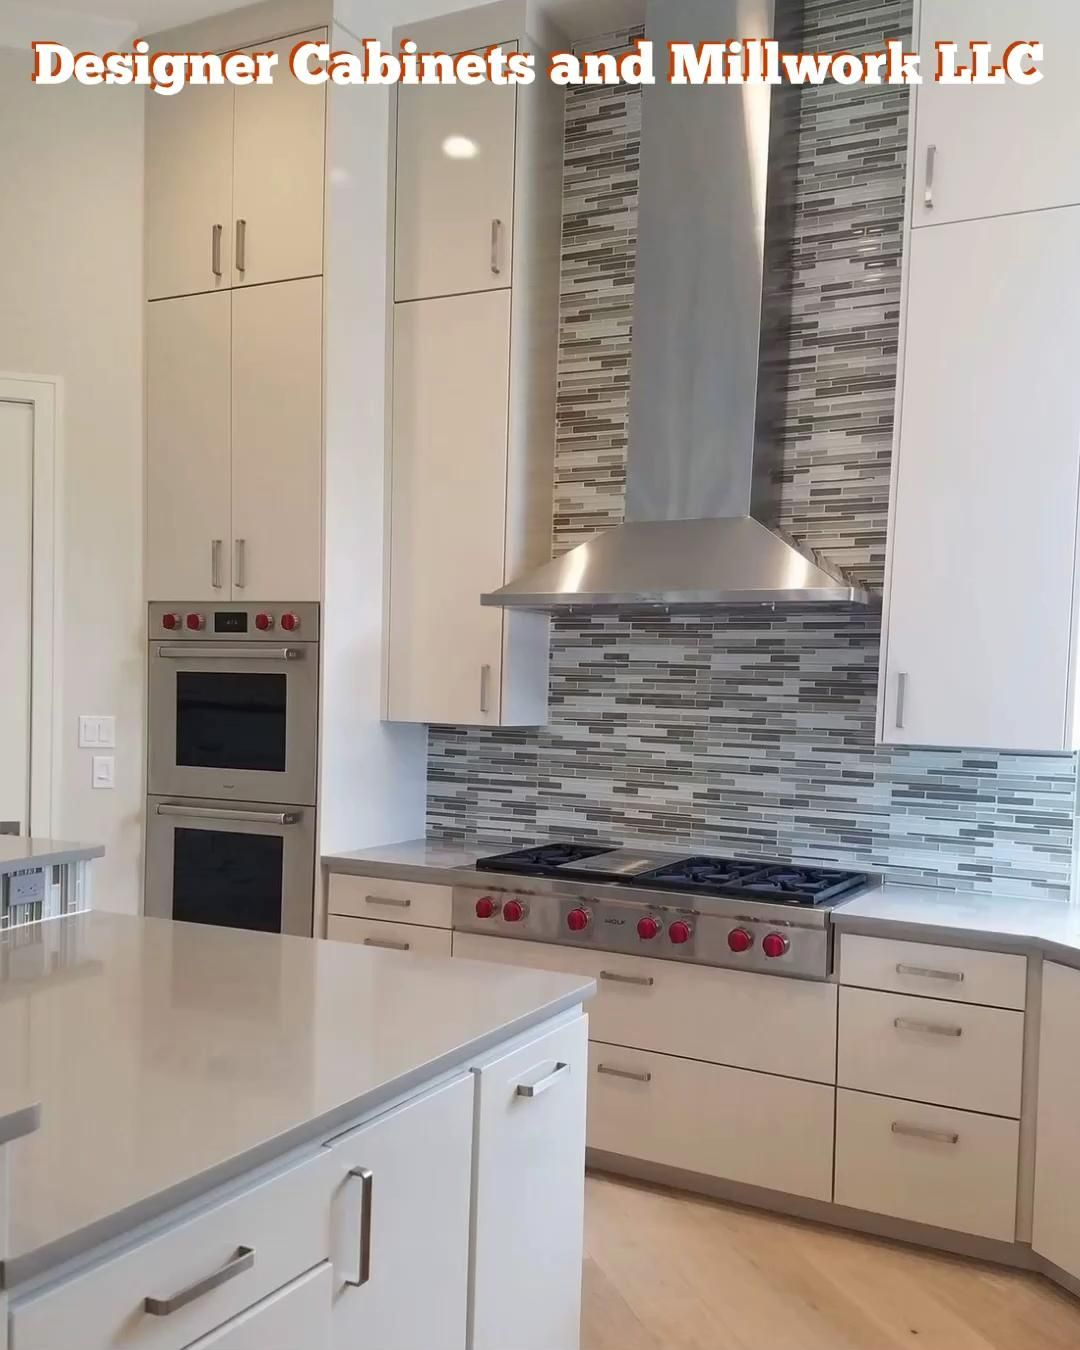 Modern high gloss full overlay kitchen with Wolf appliances and quartz countertops. #quartz #wolf #gloss #design #kitchen #renovation #newbuild #cabinets #custom #architecture #designer